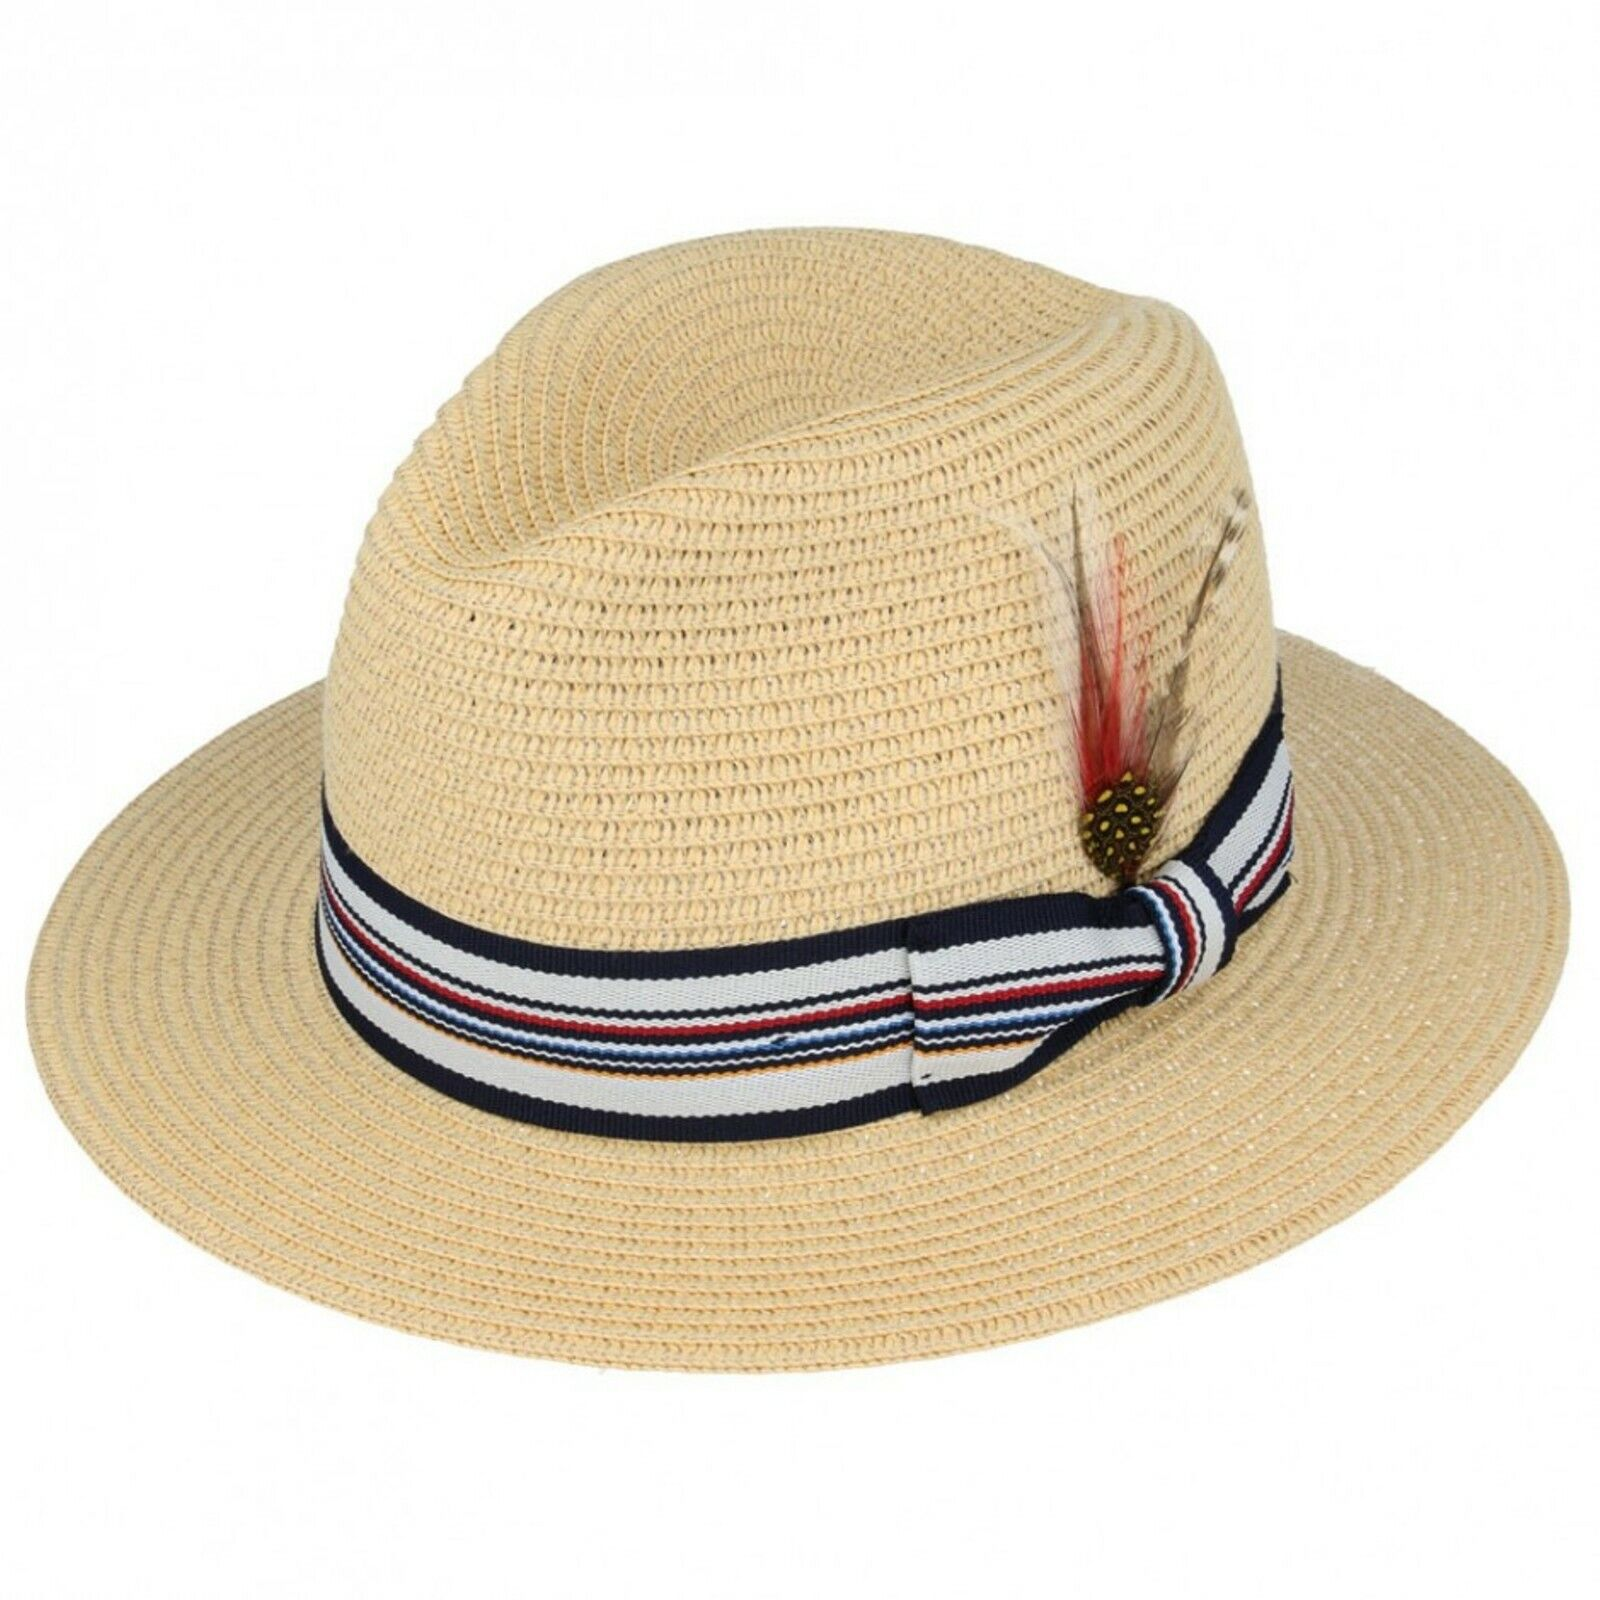 Cookisn Beach Sun Hat Large Brim Panama Hat Paper Straw Cap Black Ribbon